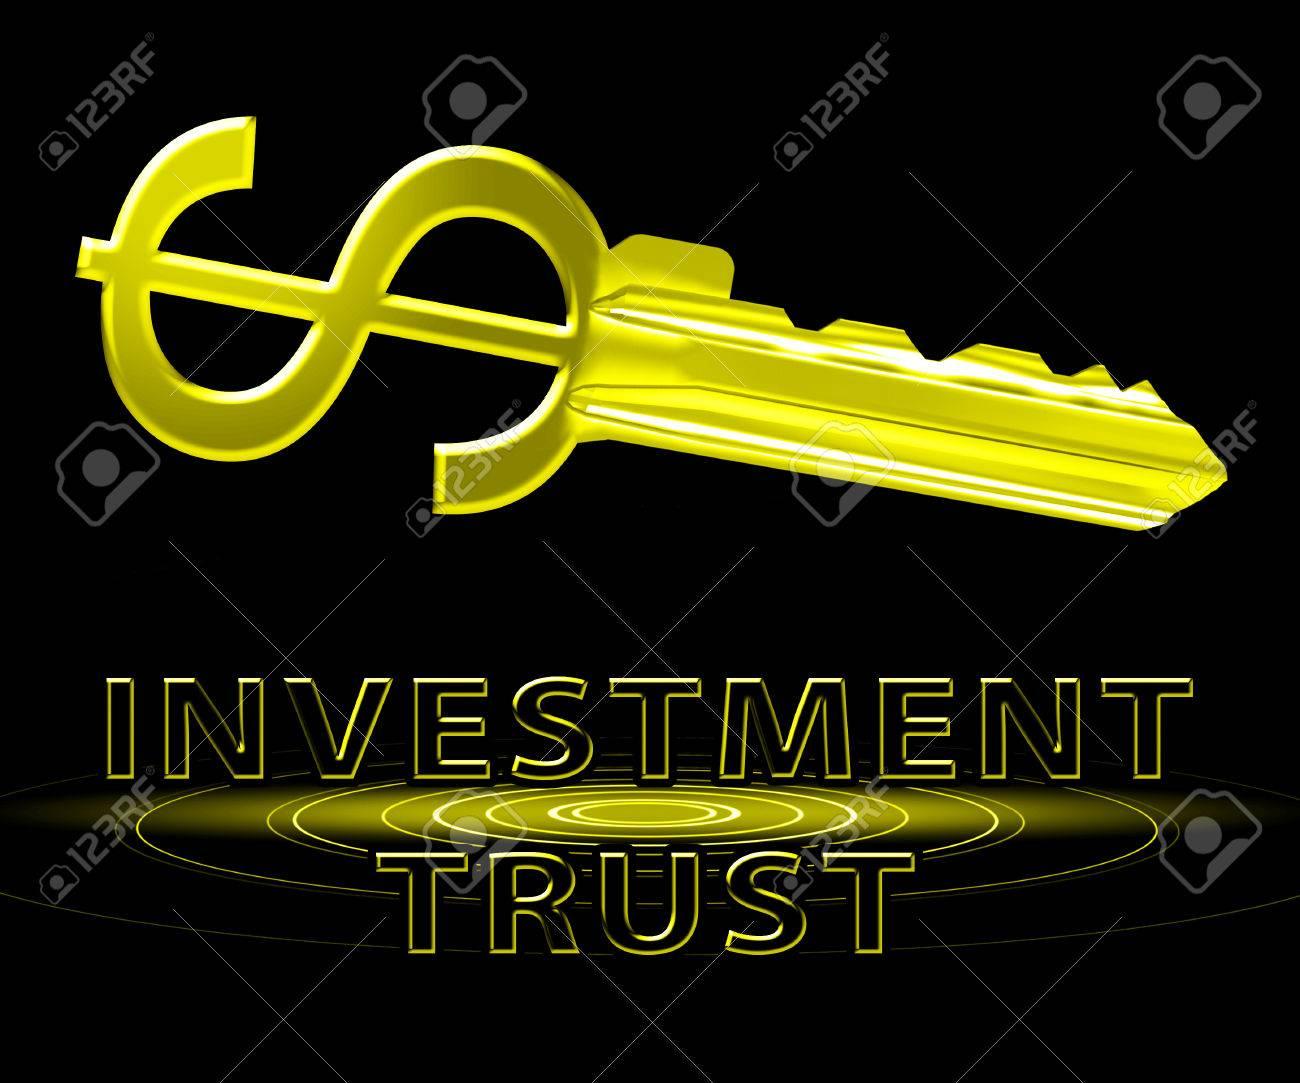 Investment Trust Dollar Key Means Investing Fund 3d Illustration